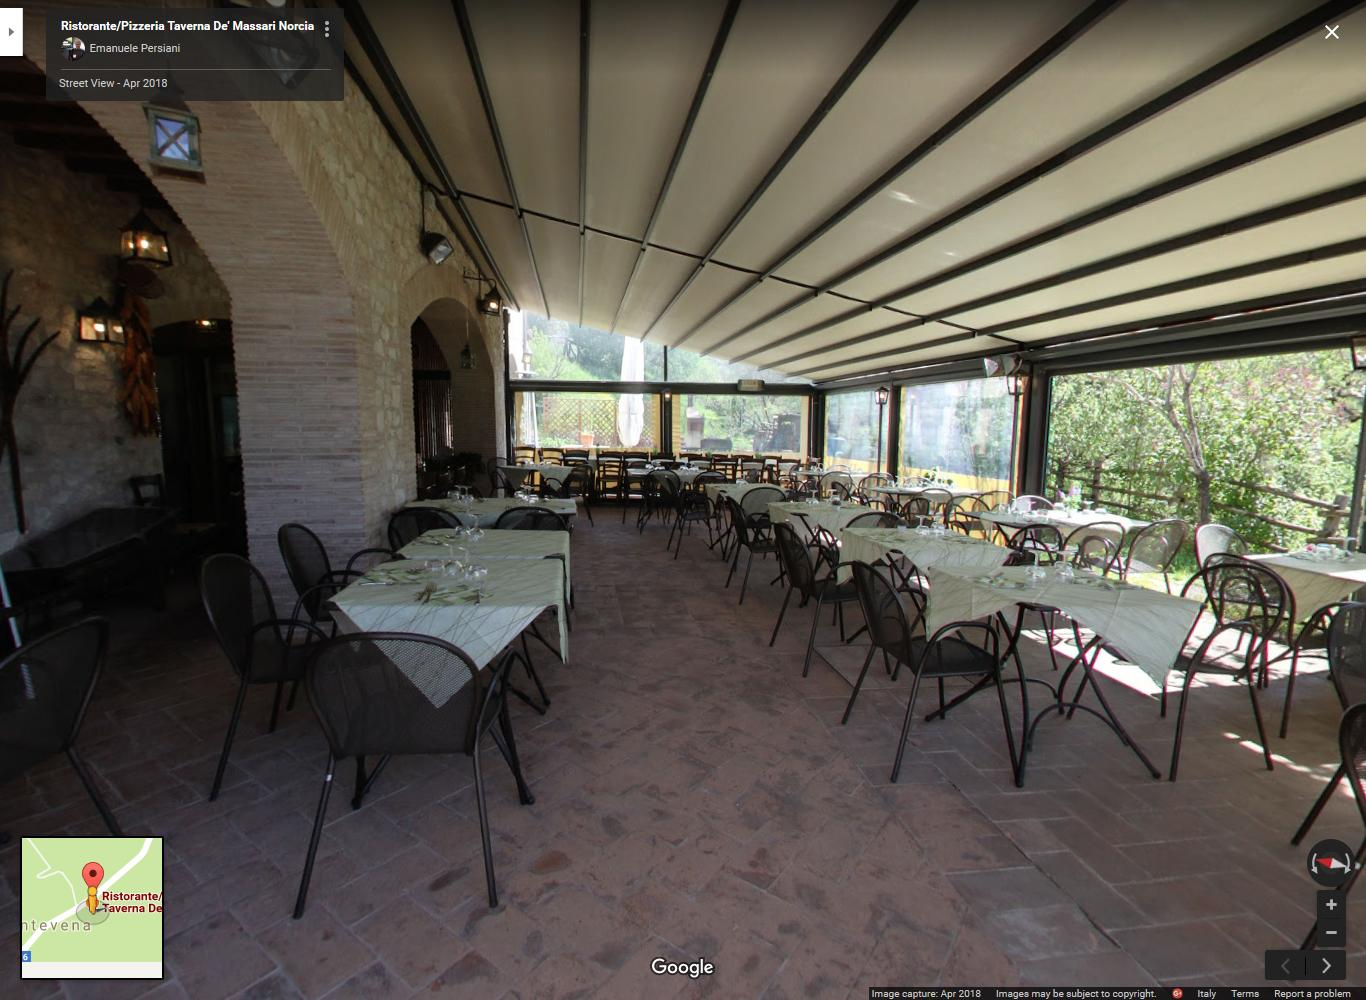 Taverna de Massari Ristorante Pizzeria